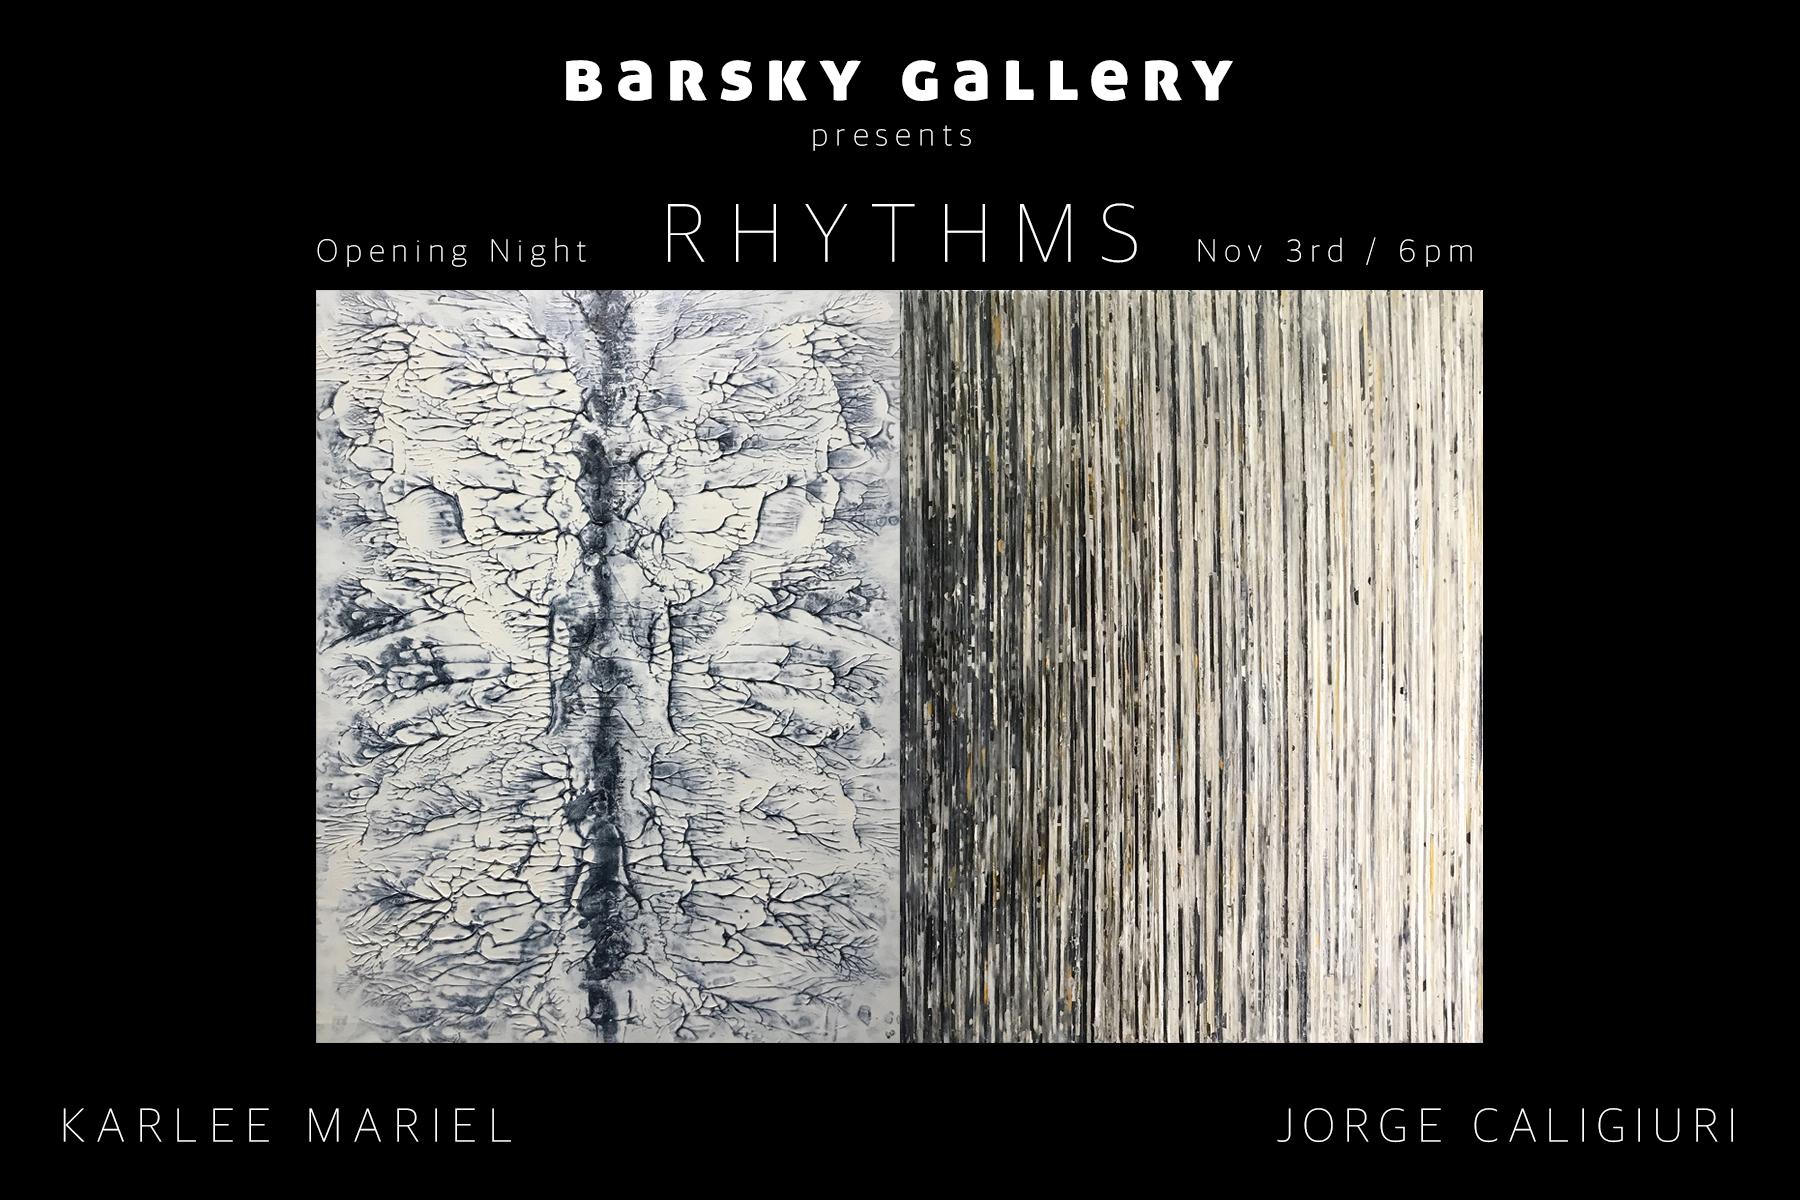 Barsky Gallery - RHYTHMS Exhibition by Karlee Mariel & Jorge Caligiuri